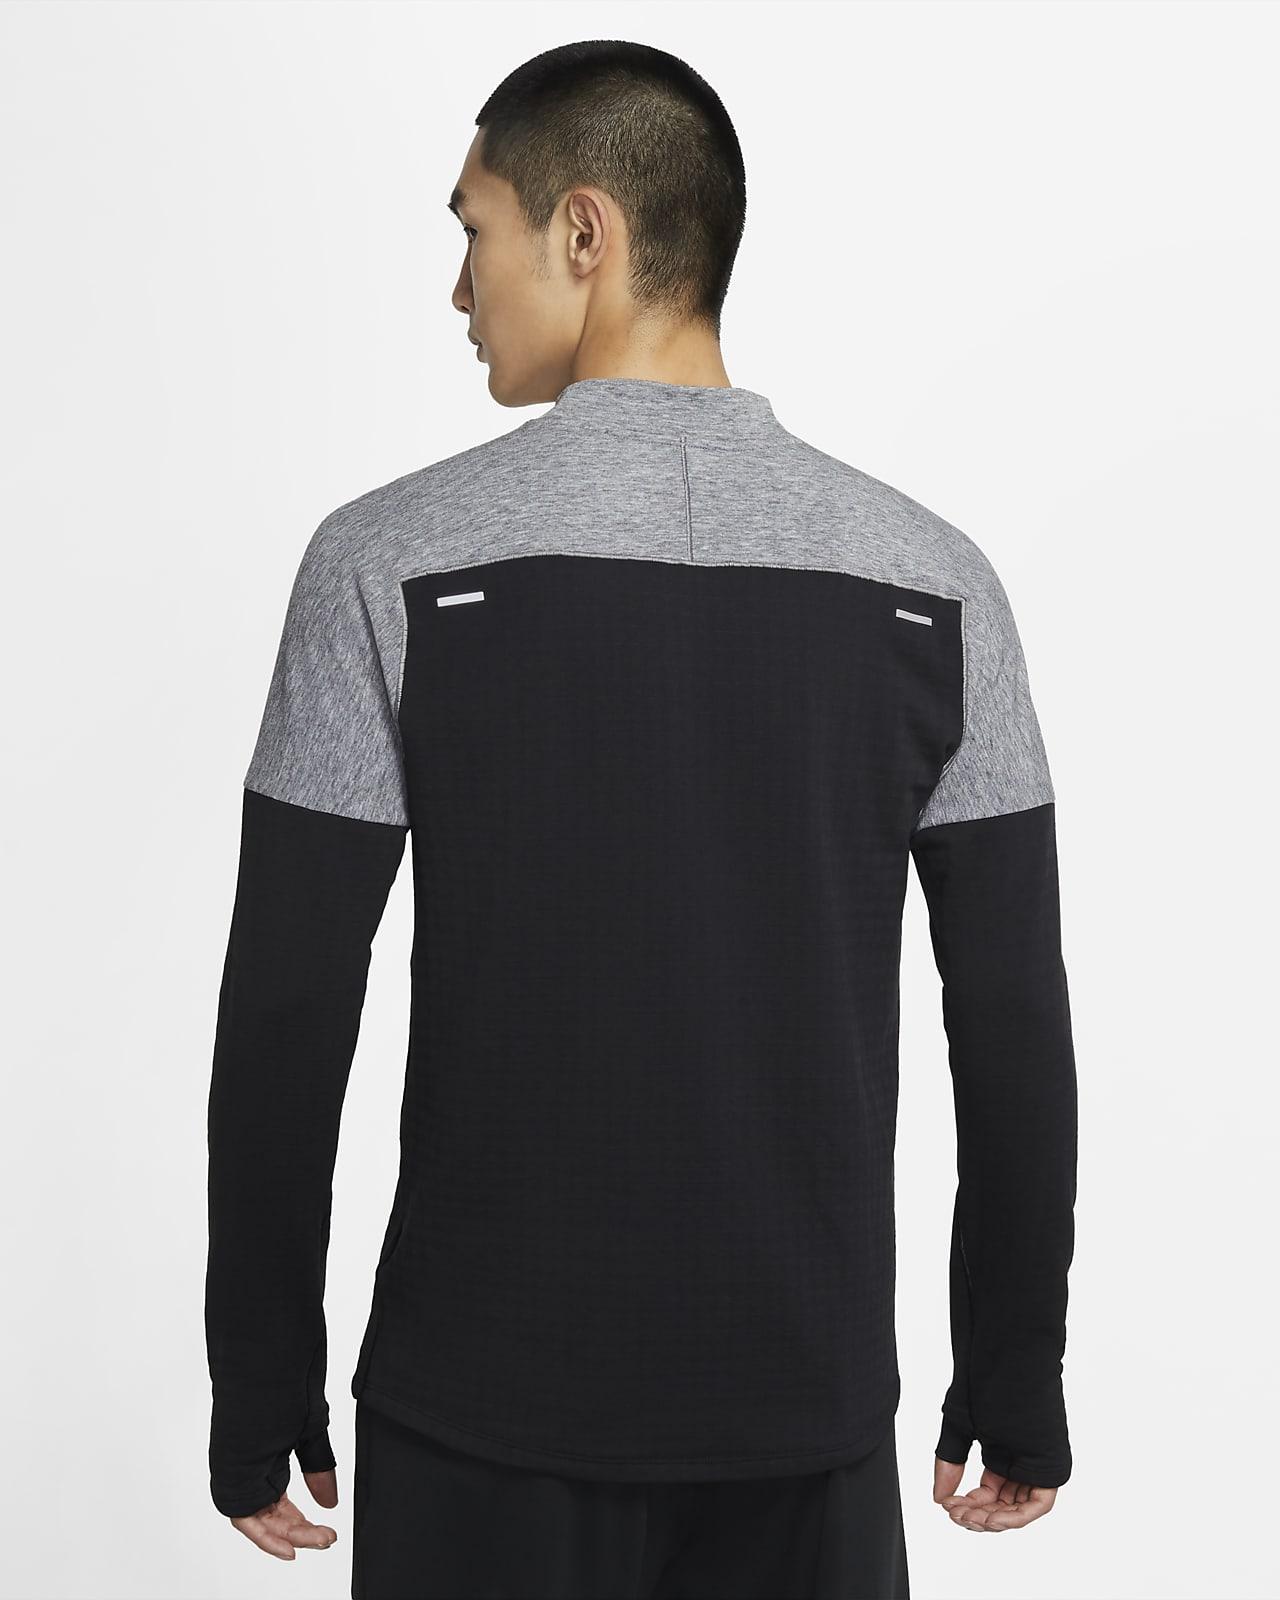 Nike Sphere Run Division Men's Wool Running Top